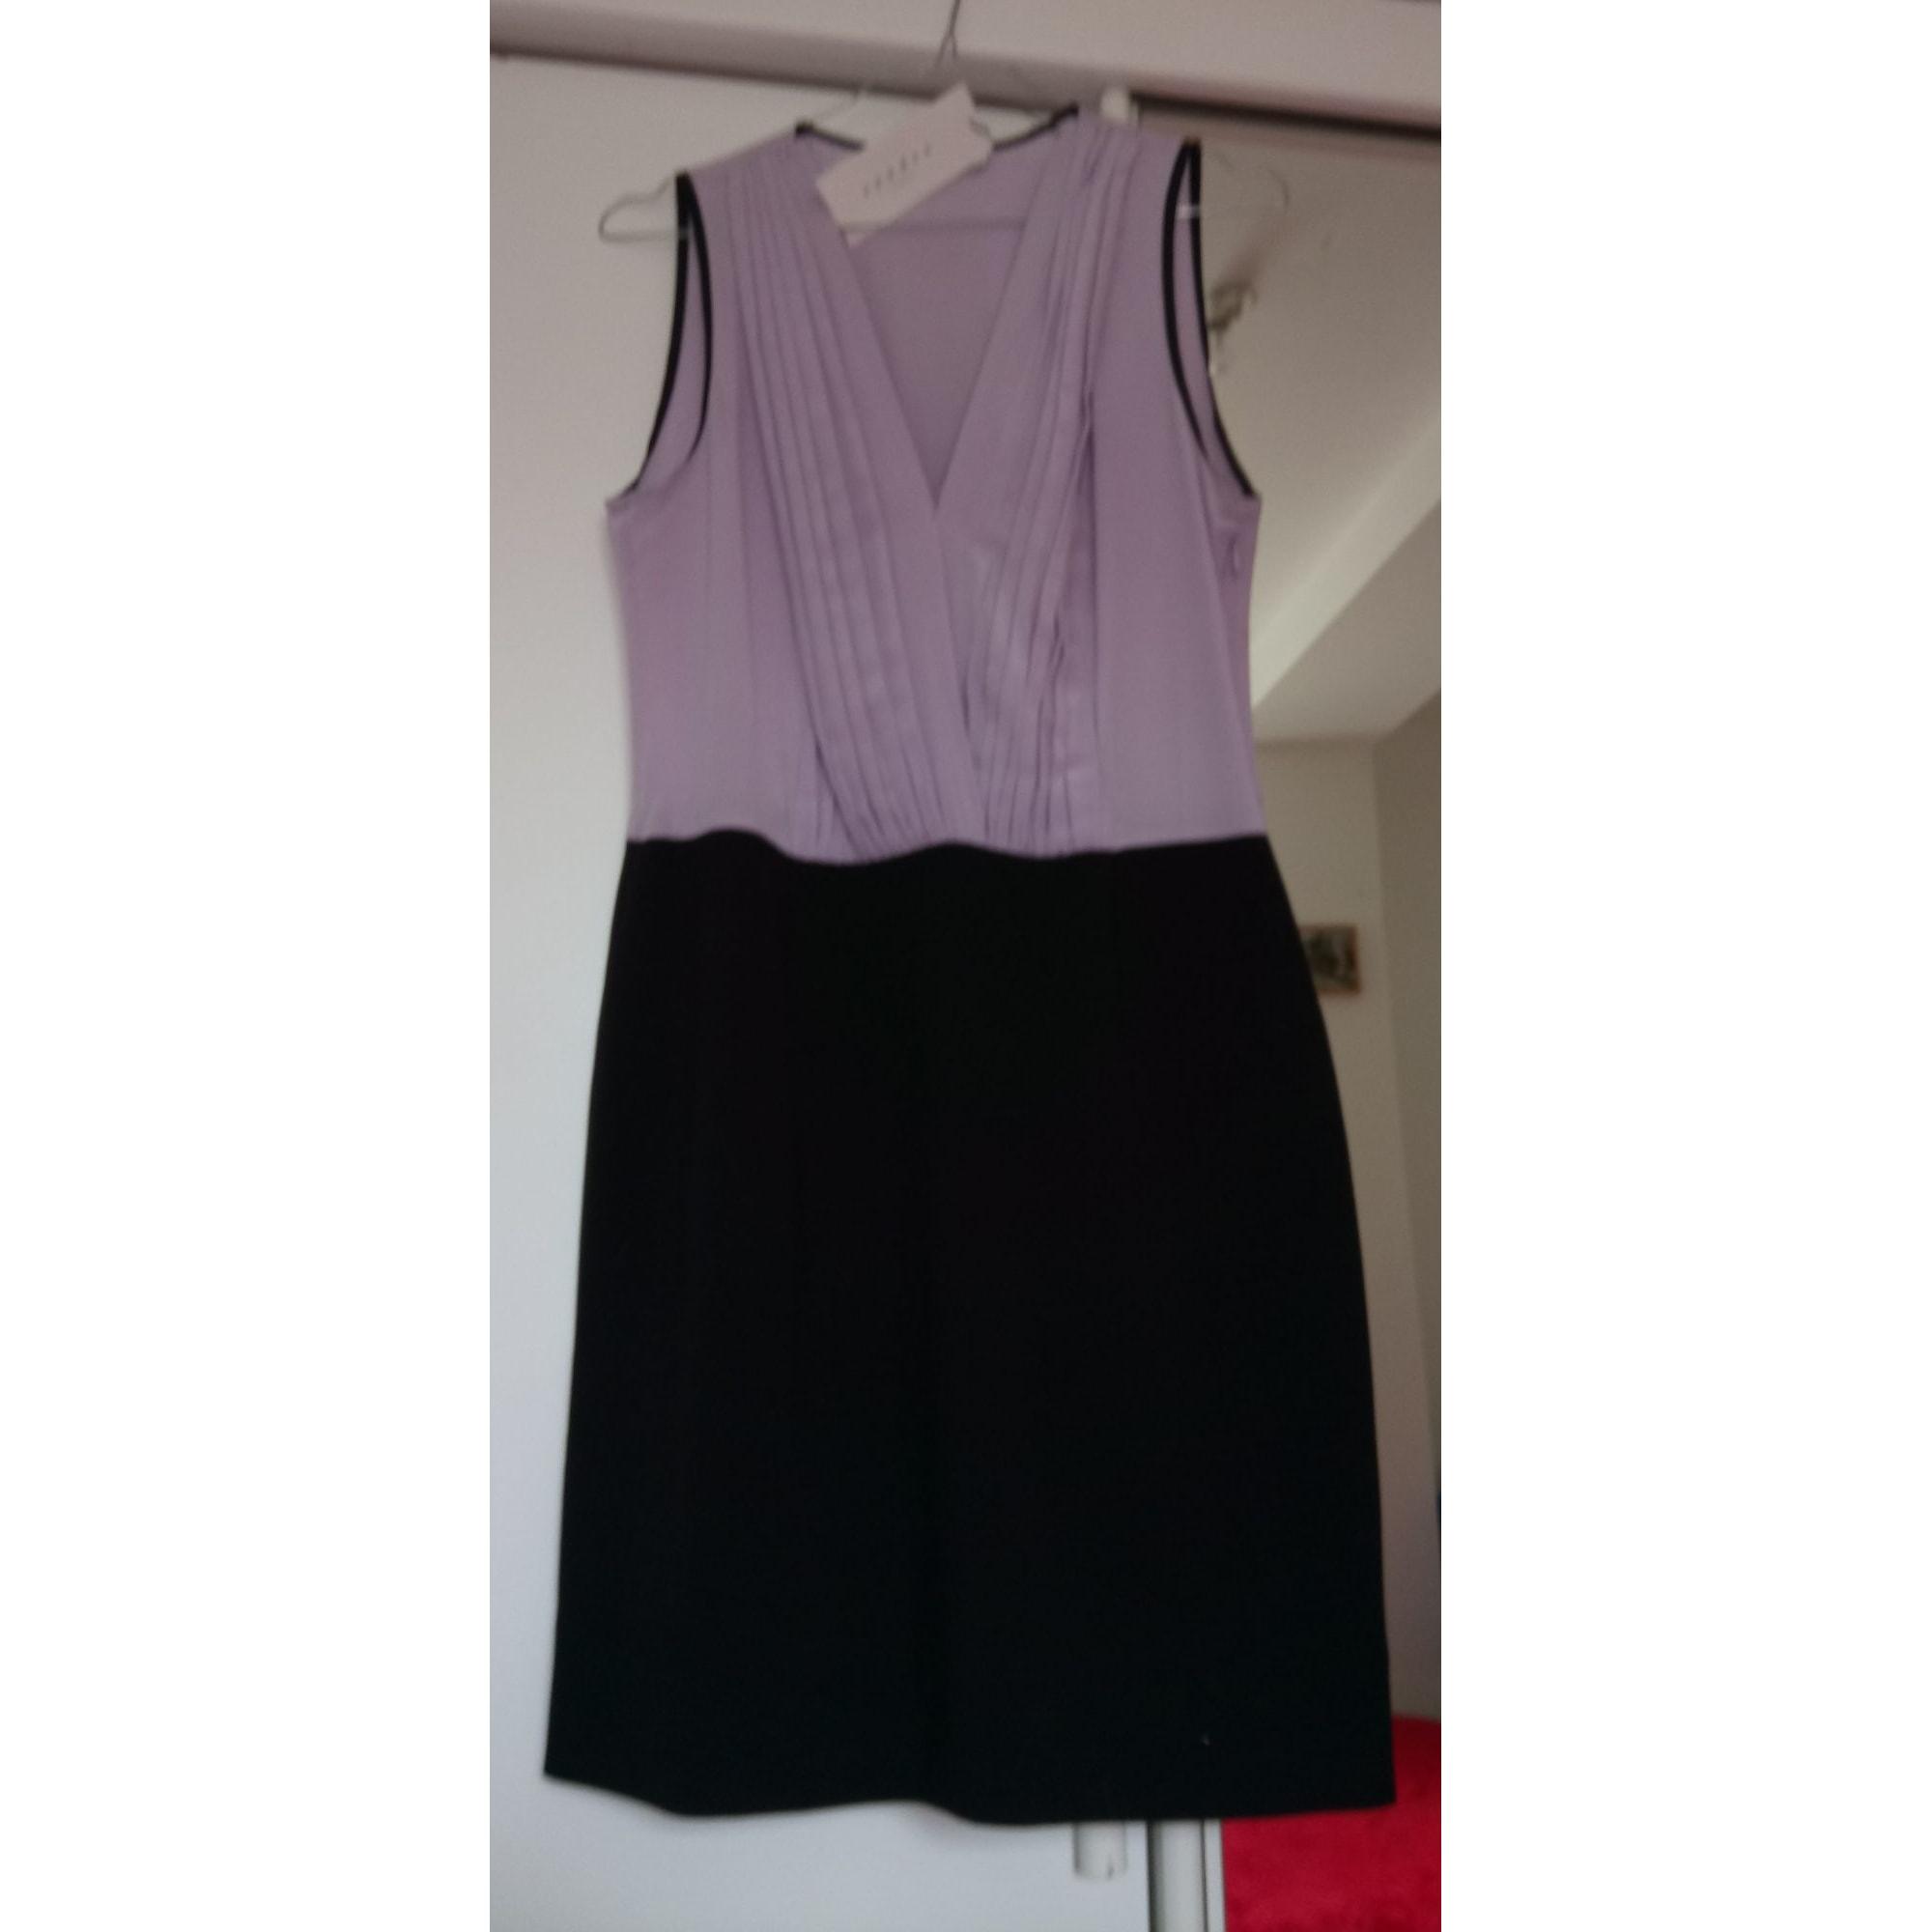 Maje Robe courte polyester-elasthane autre 38 (M, T2)